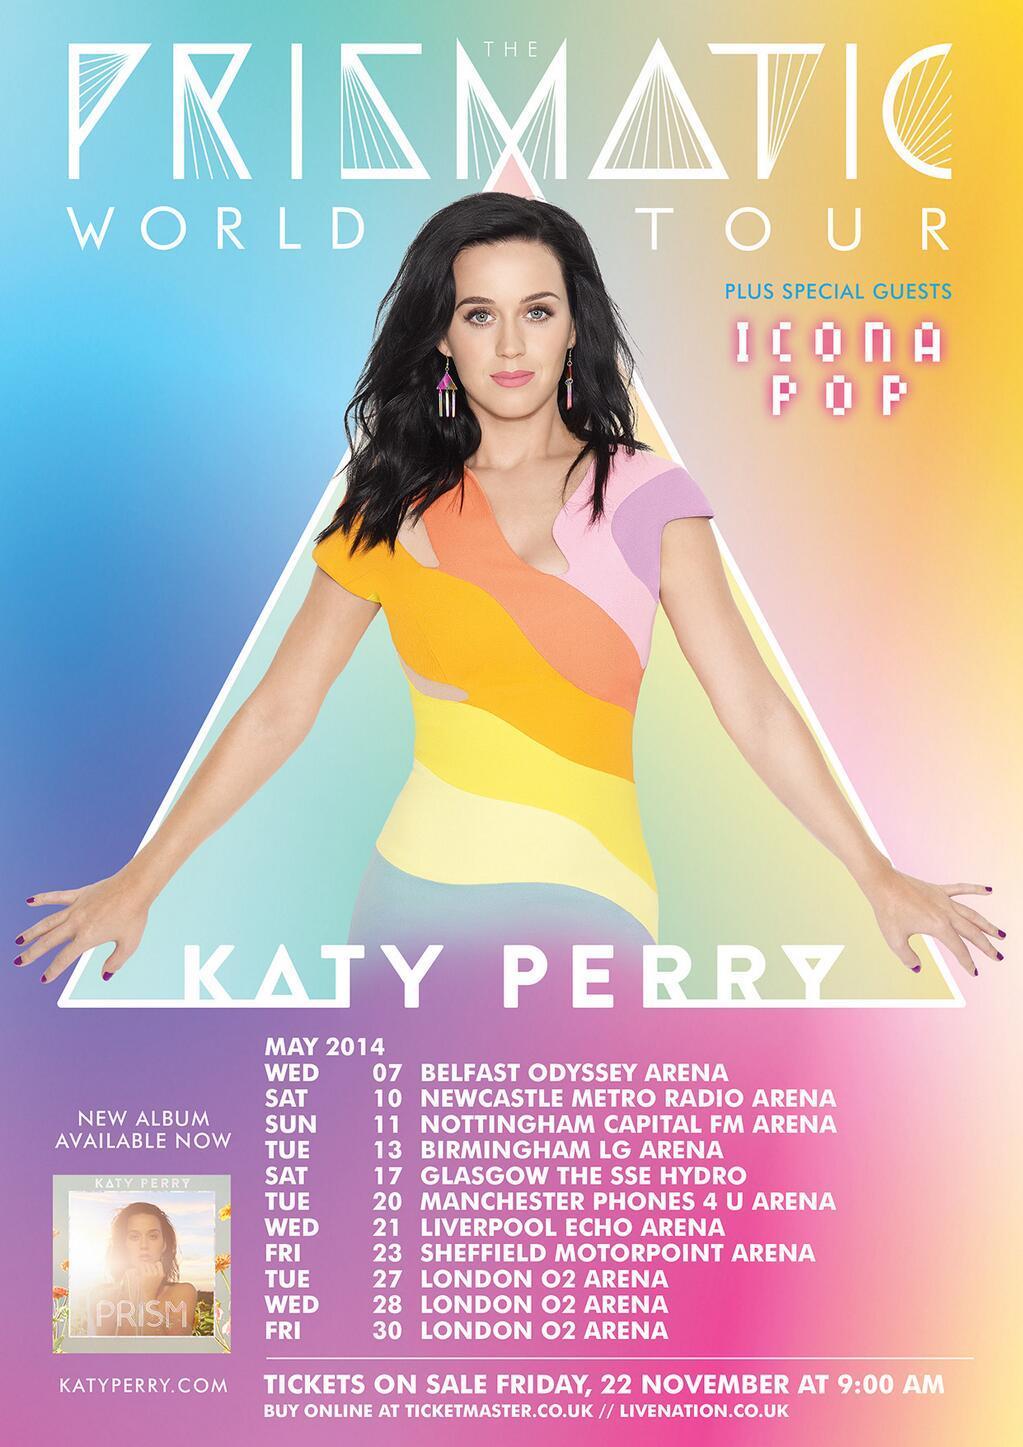 Katy Perry >> The Prismatic World Tour Tumblr_mwgsb3Vd1Y1qc70kwo1_1280